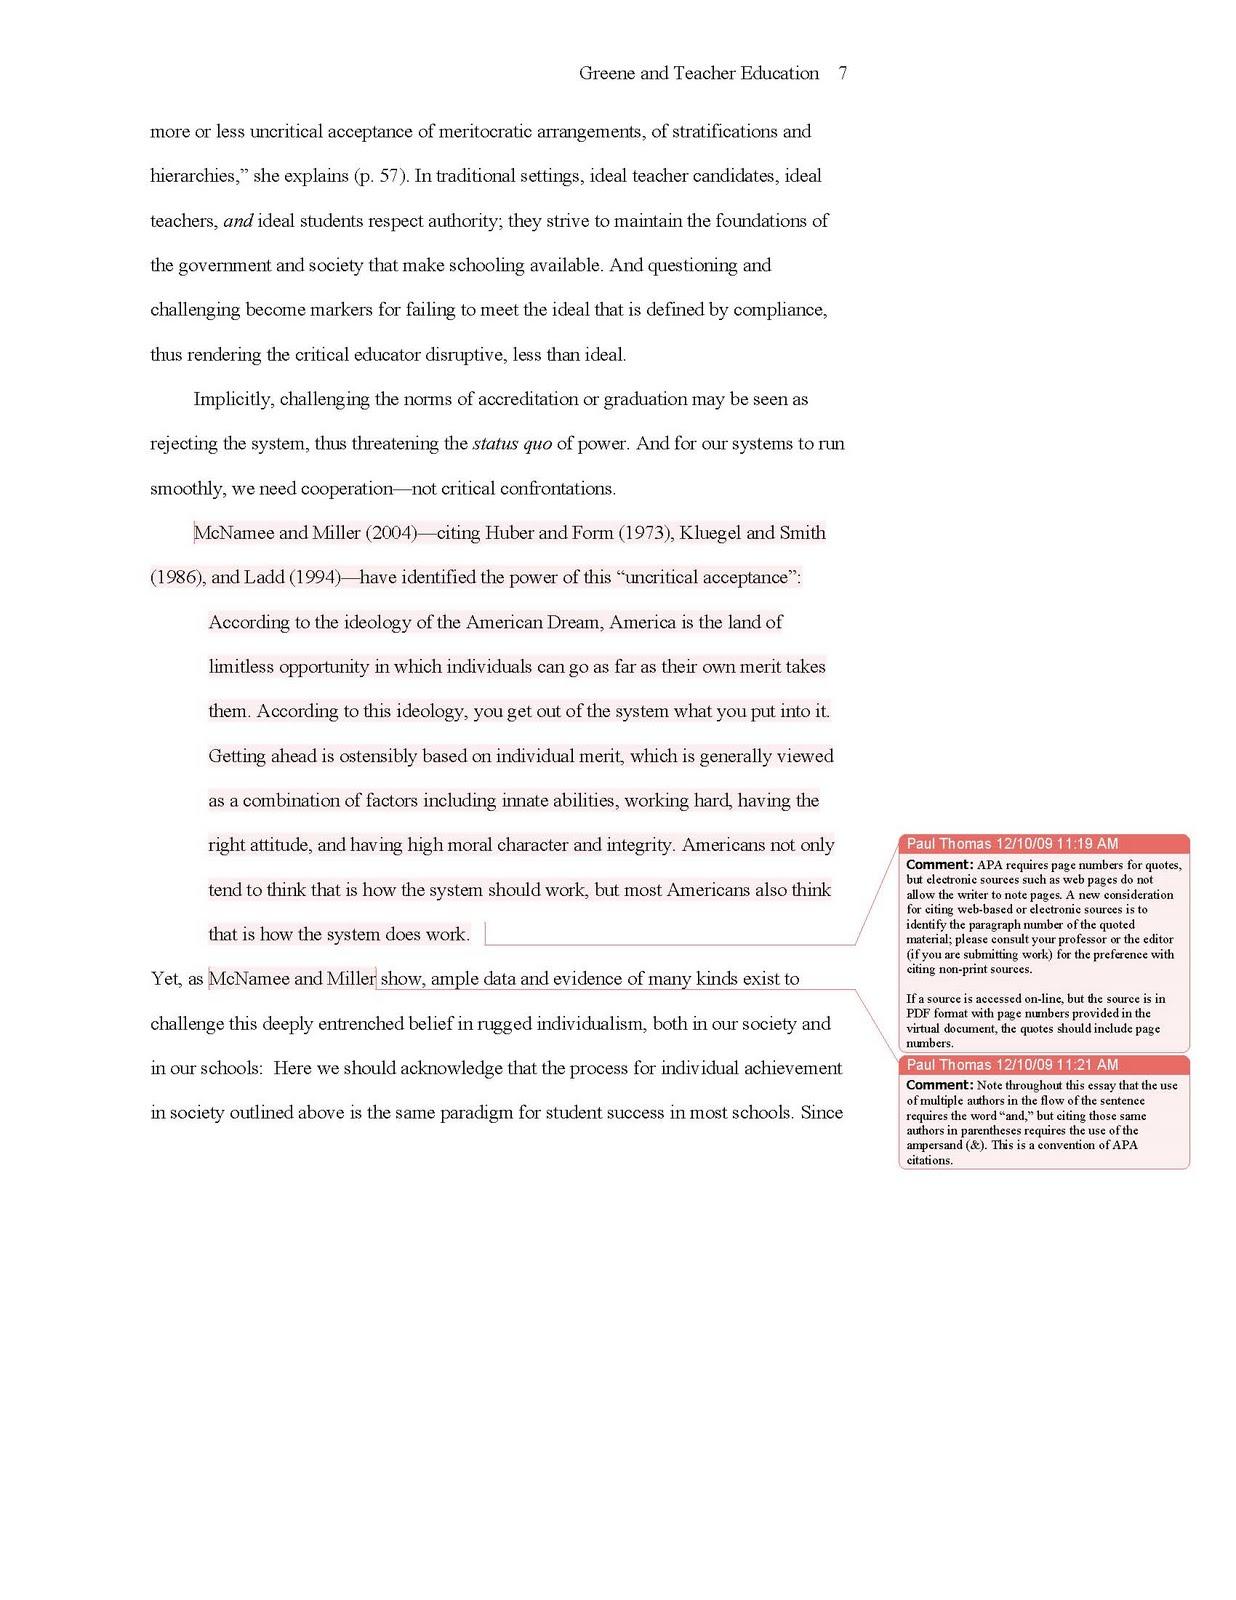 014 Descriptive Essay Thesis Apa Sample 2010update7 Rare Statement Generator Pdf Full